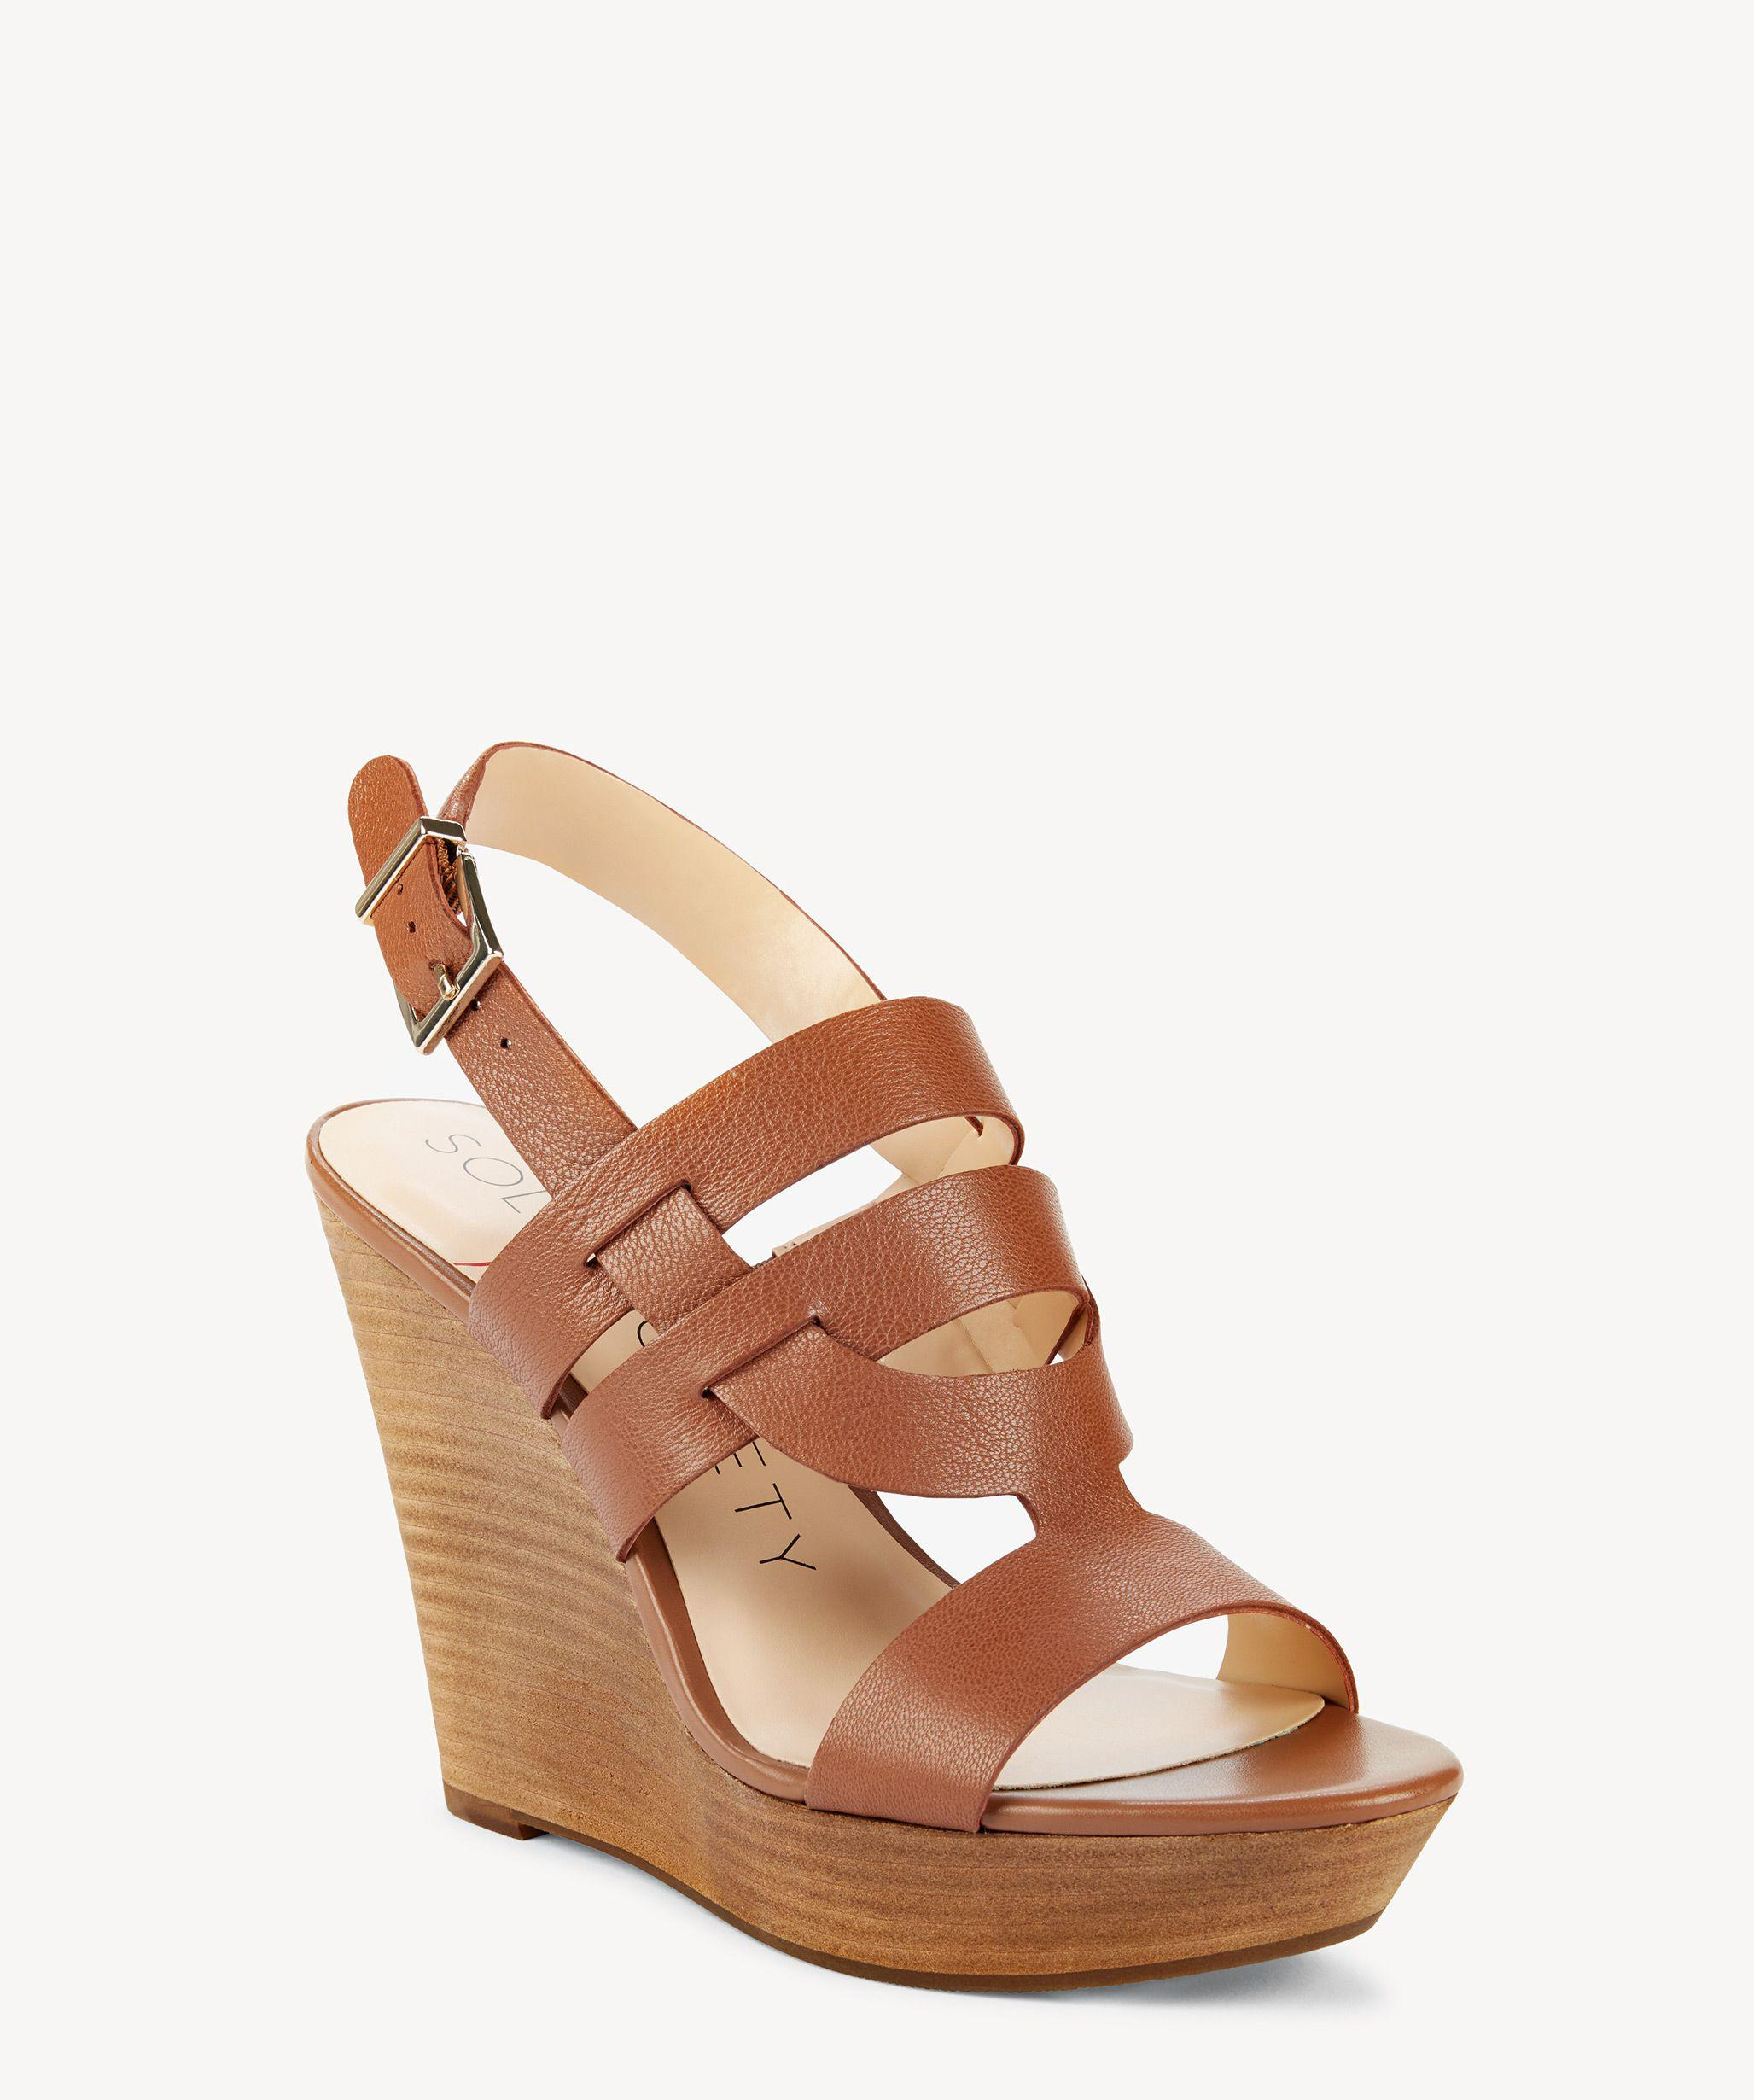 fb1e1006ea2b Lyst - Sole Society Jenny Platform Wedge Sandal in Brown